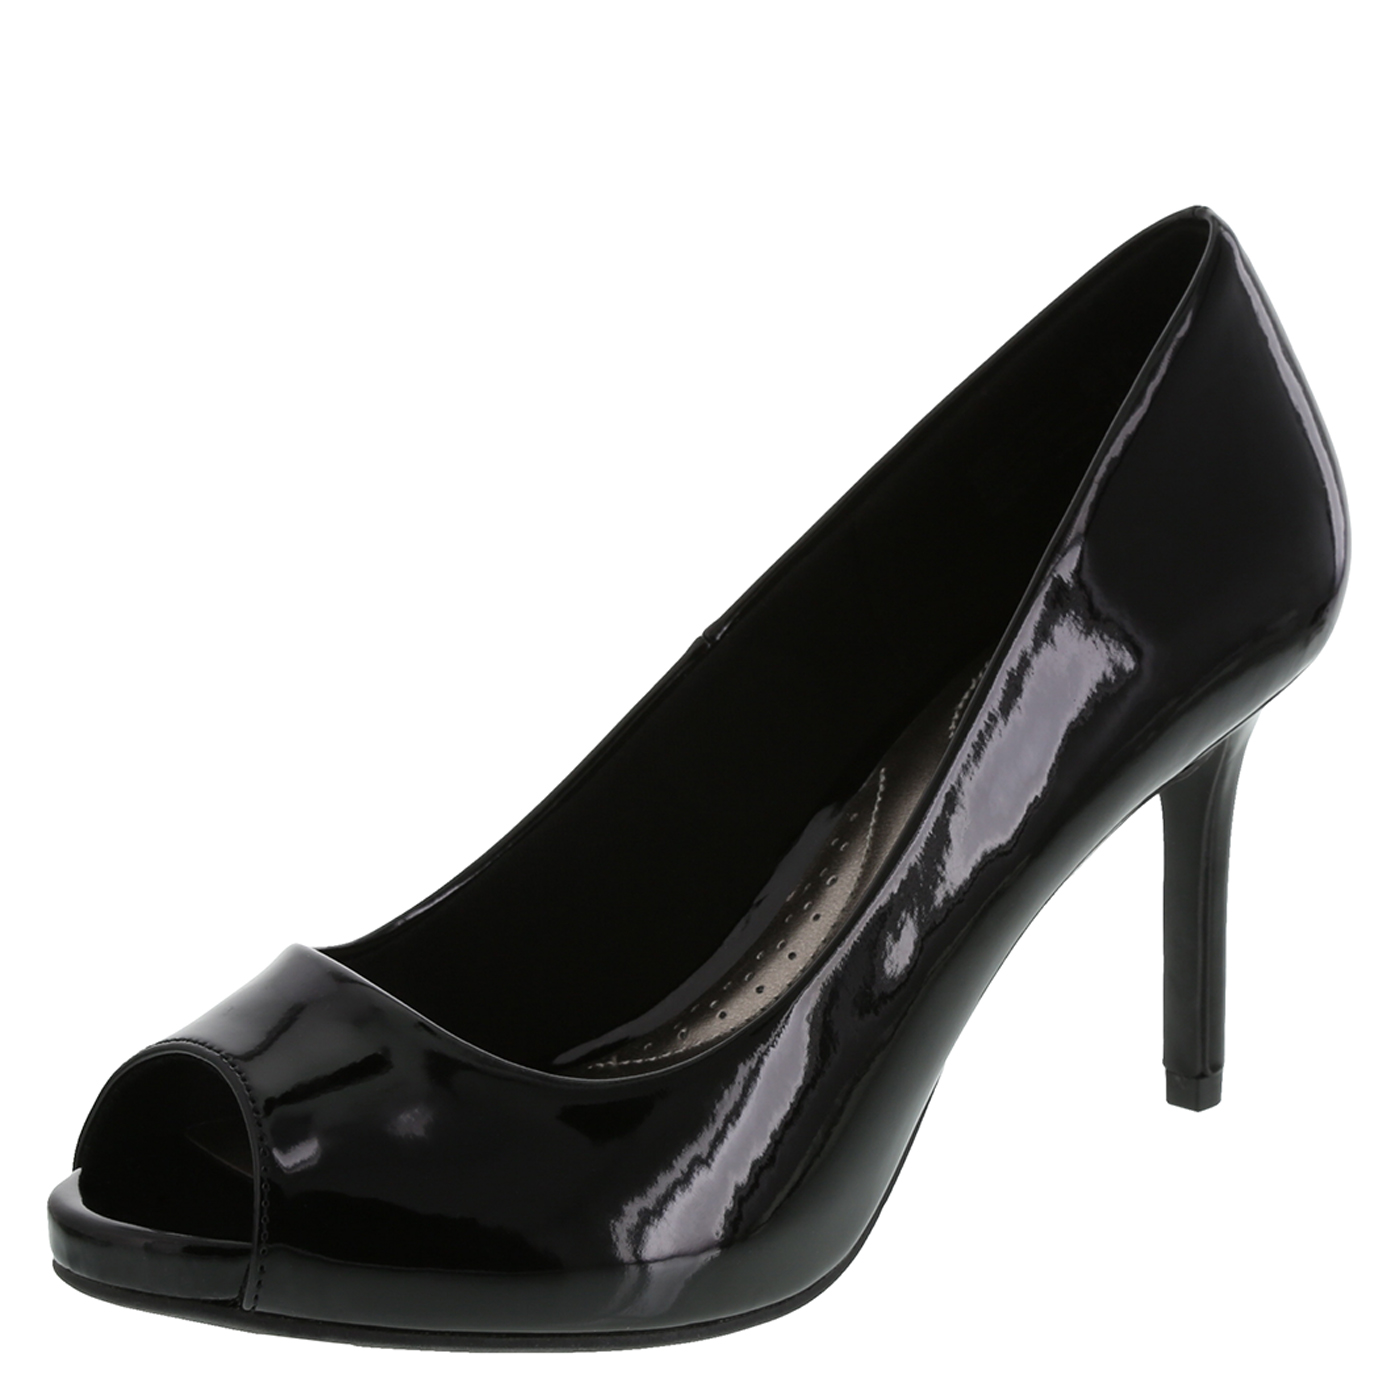 peep toe pumps womenu0027s karmichael peep toe pumpwomenu0027s karmichael peep toe pump, black YXSODFR